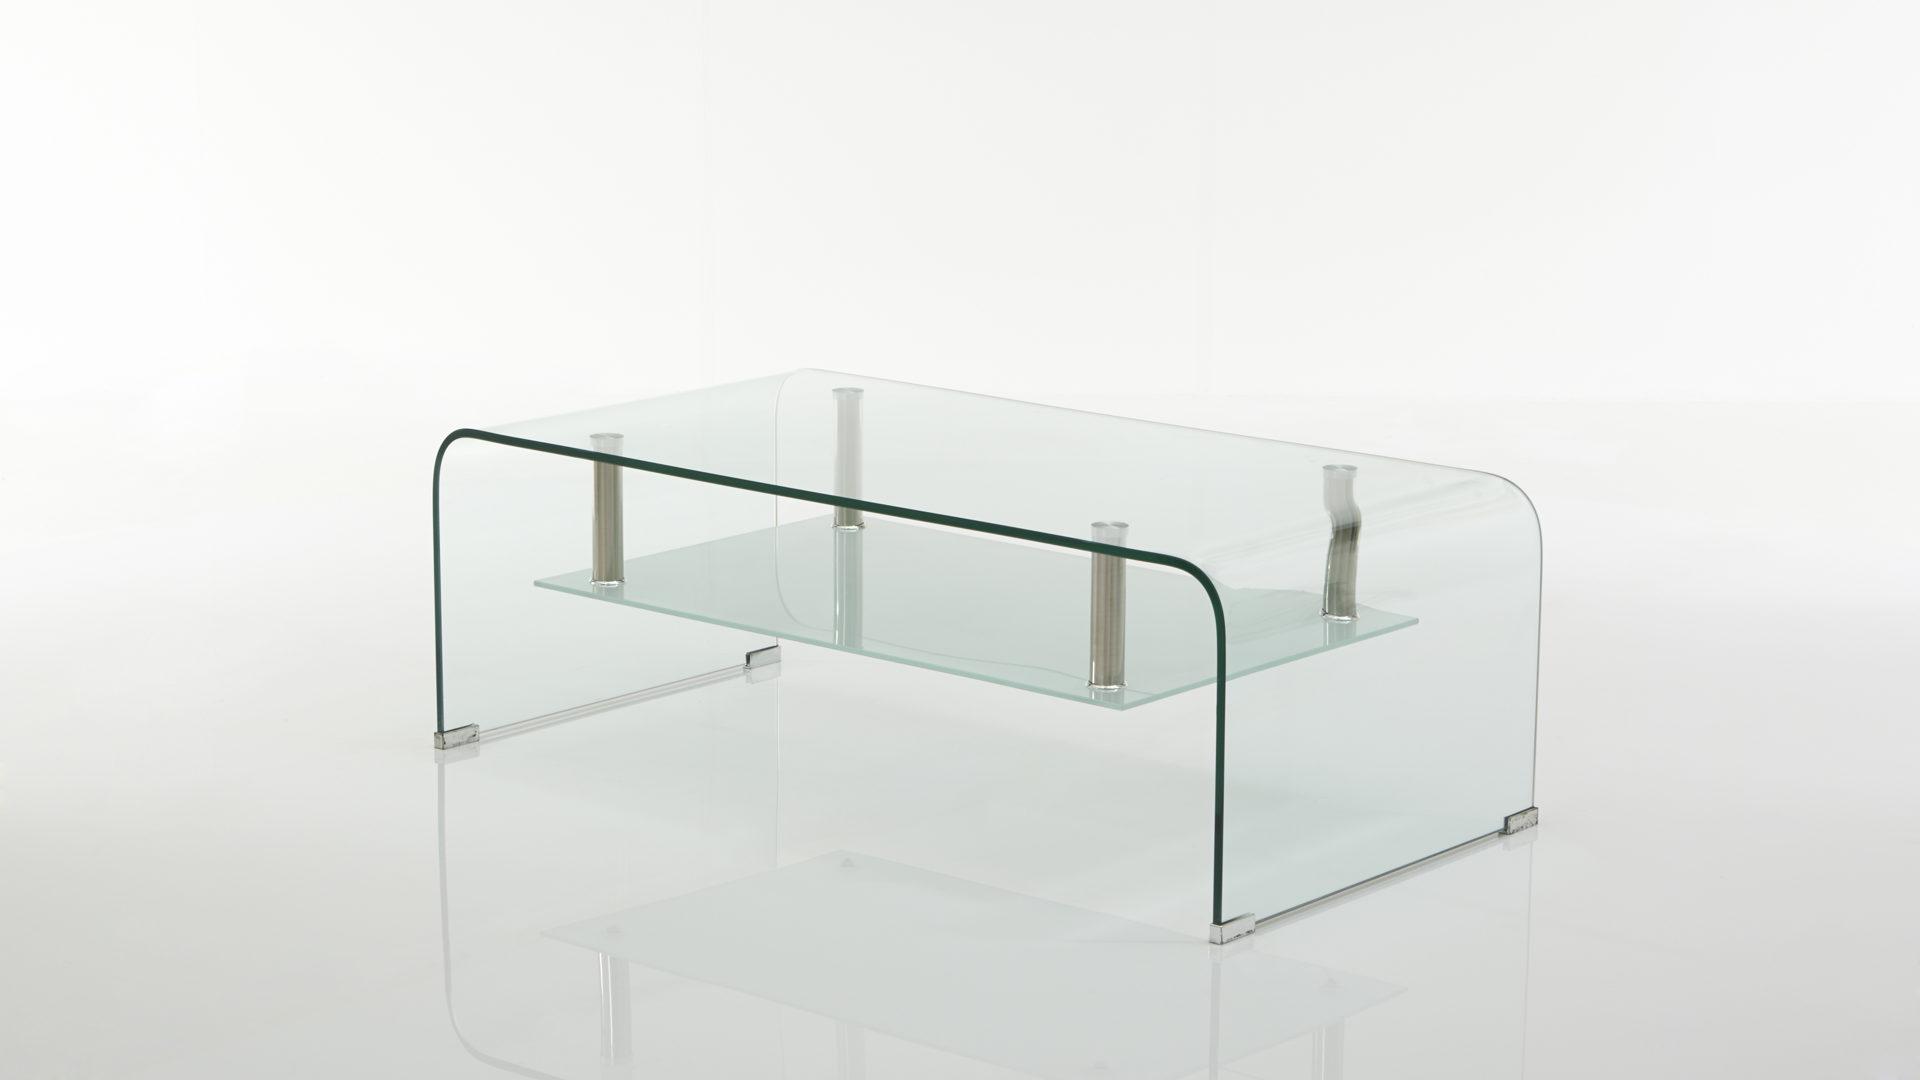 Glas Gnstig. Cheap Alu Glas Uberdachung Glas Aluminium Glas With ...